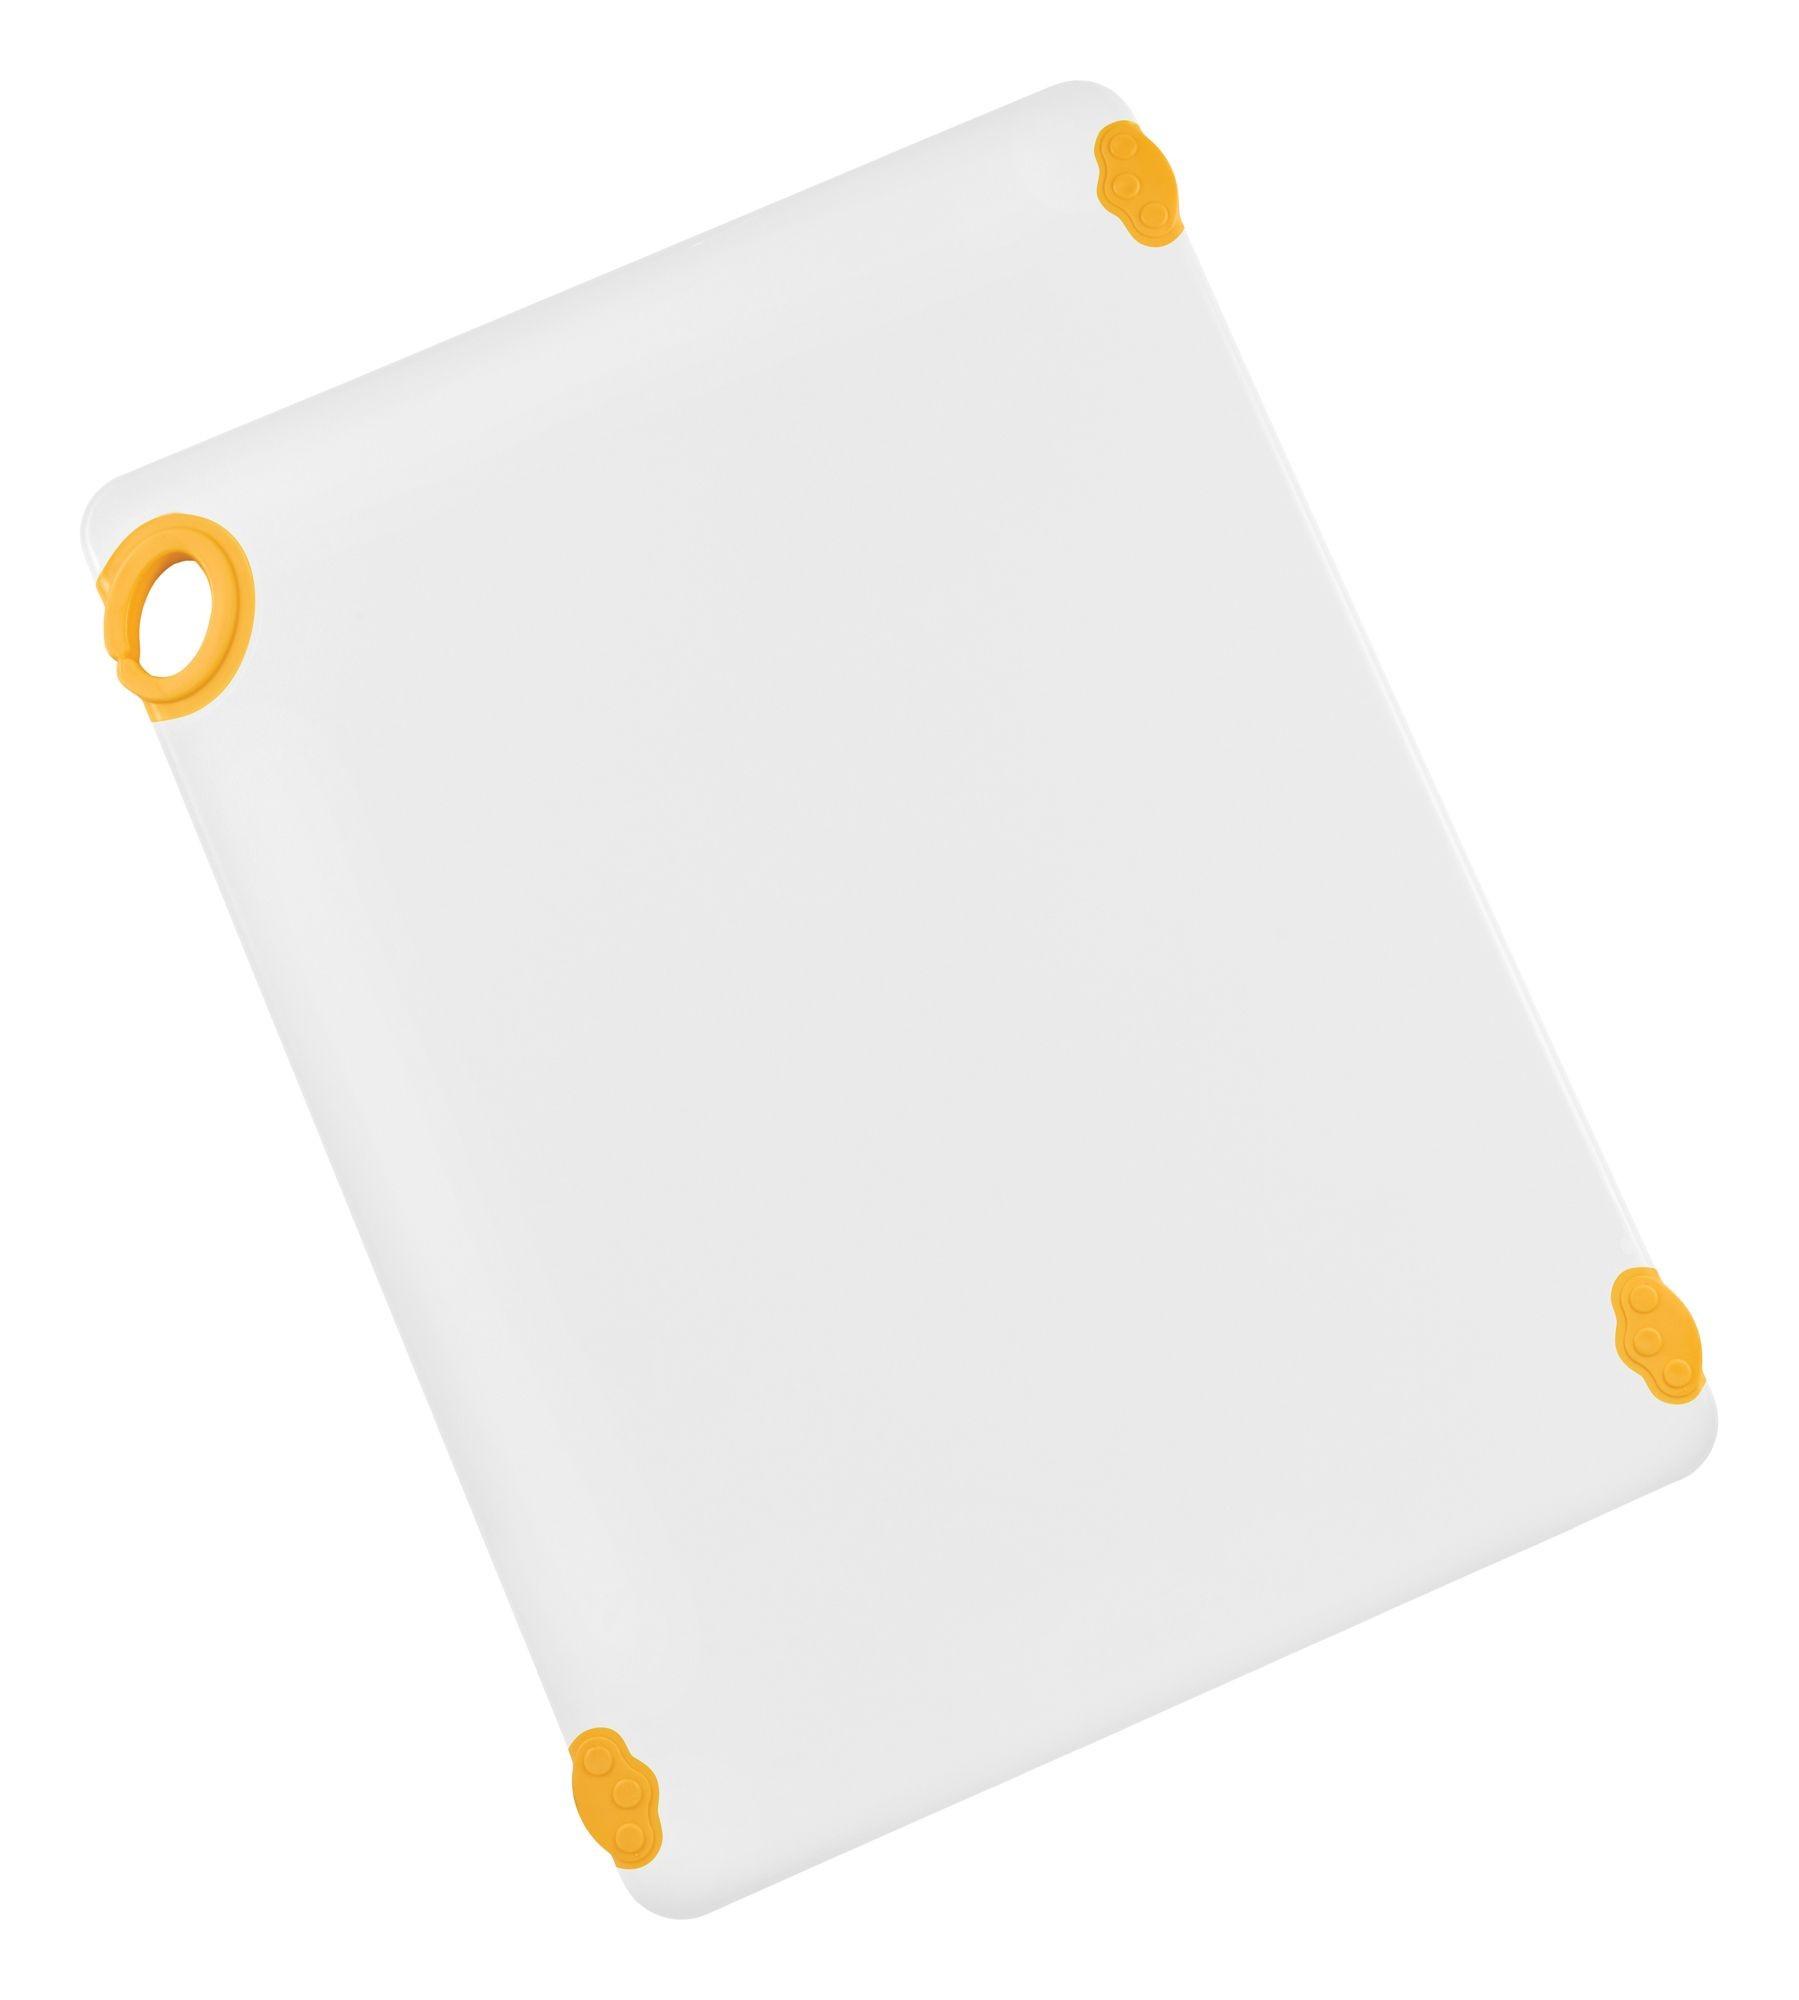 "Winco CBN-1824YL Yellow StatikBoard Cutting Board with Hook, 18"" x 24"" x 1/2"""